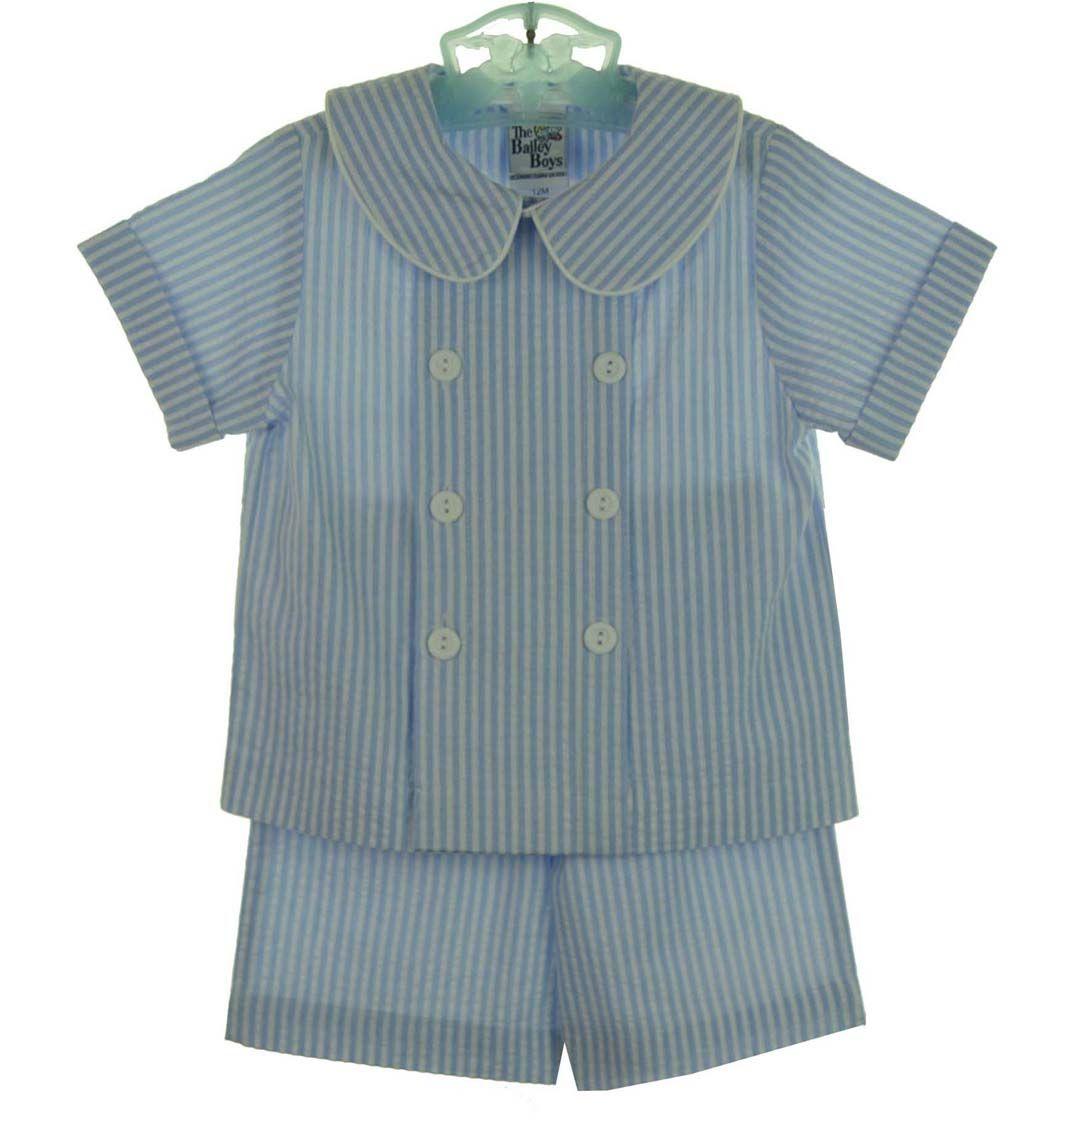 879b1d800 NEW Bailey Boys Blue Seersucker Striped Double Breasted Shorts Set $70.00